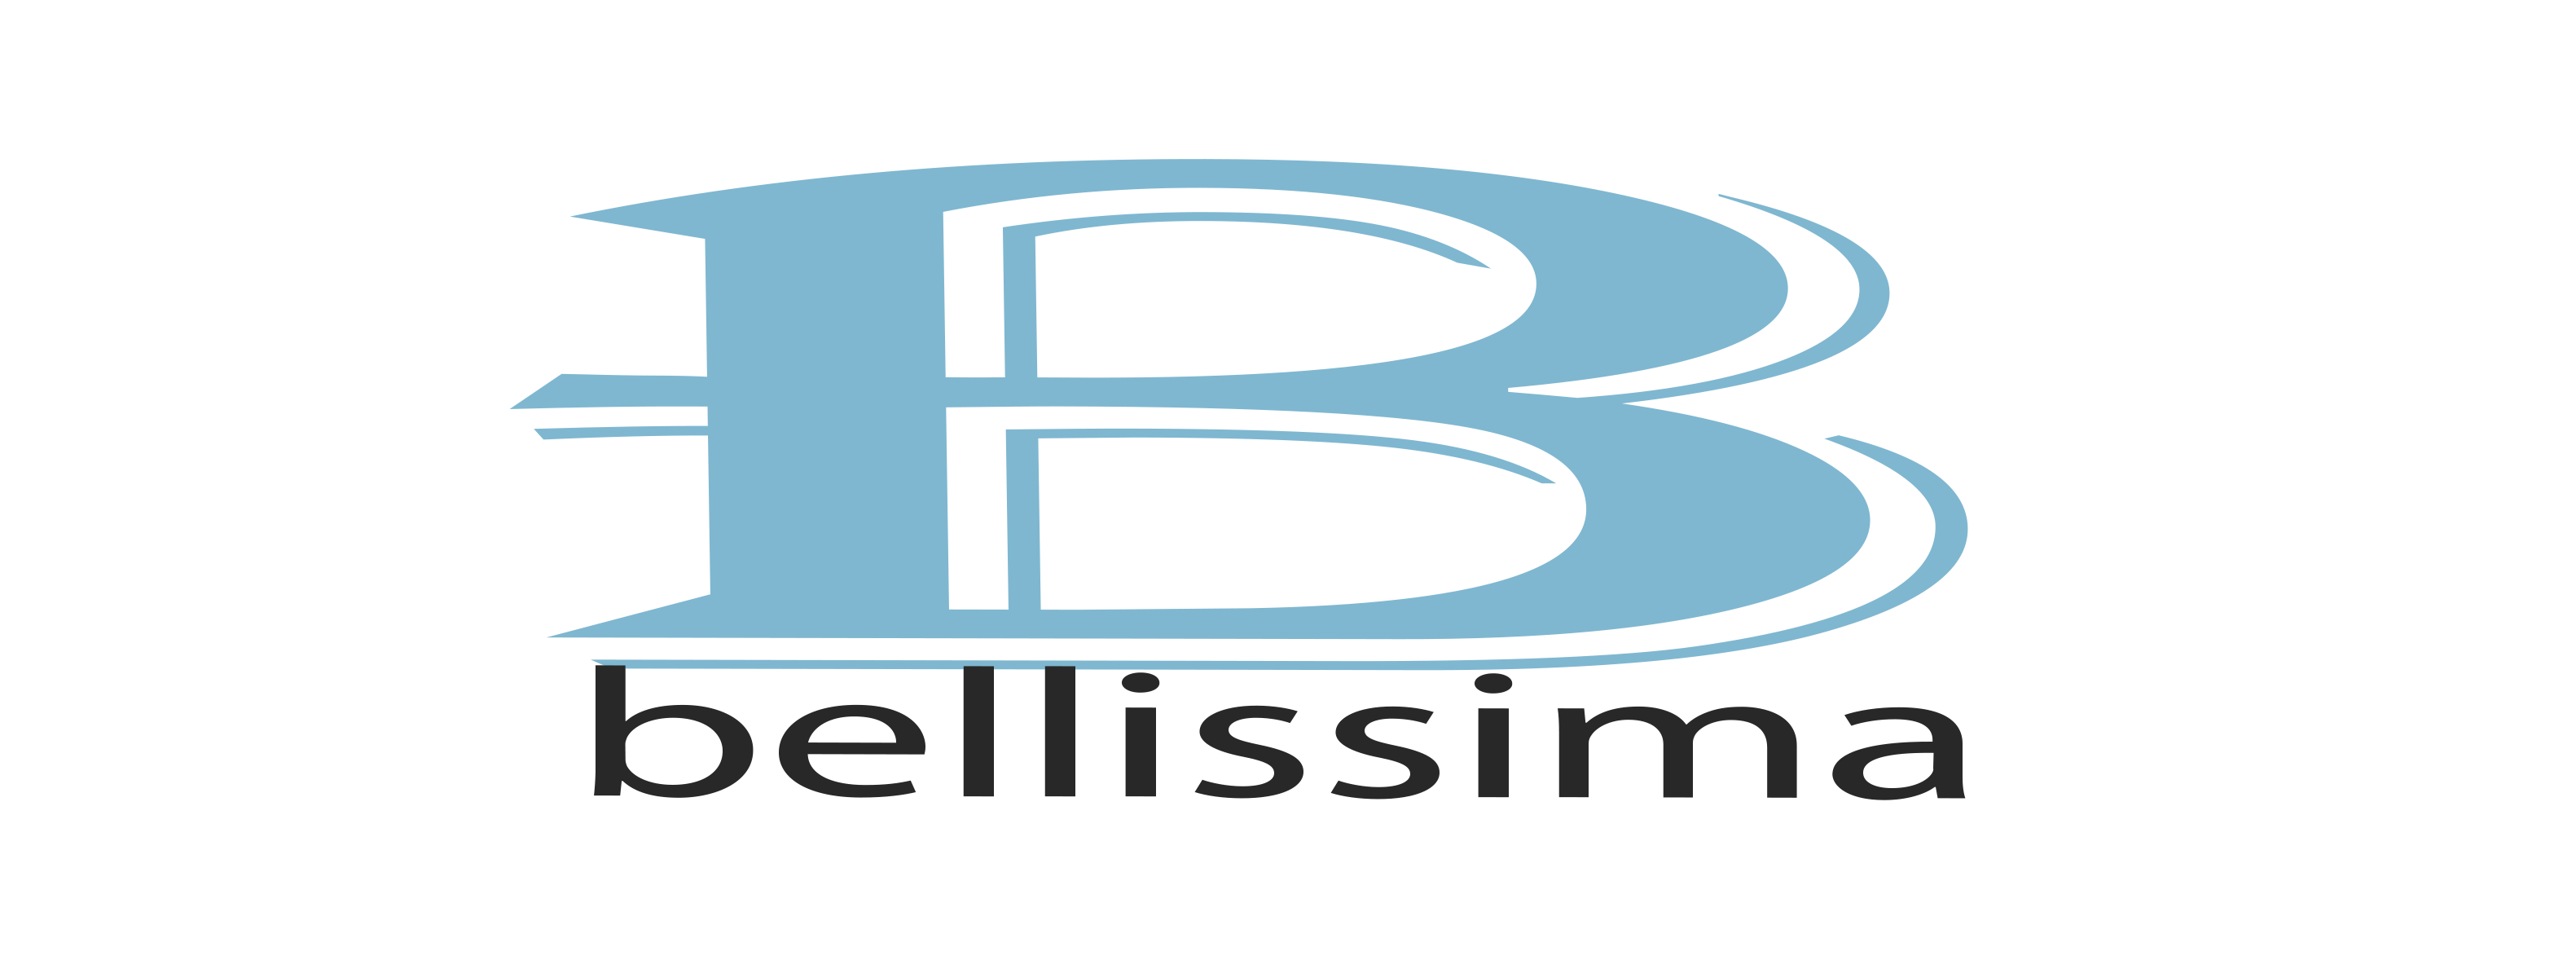 Bellissima - інтернет-магазин речей